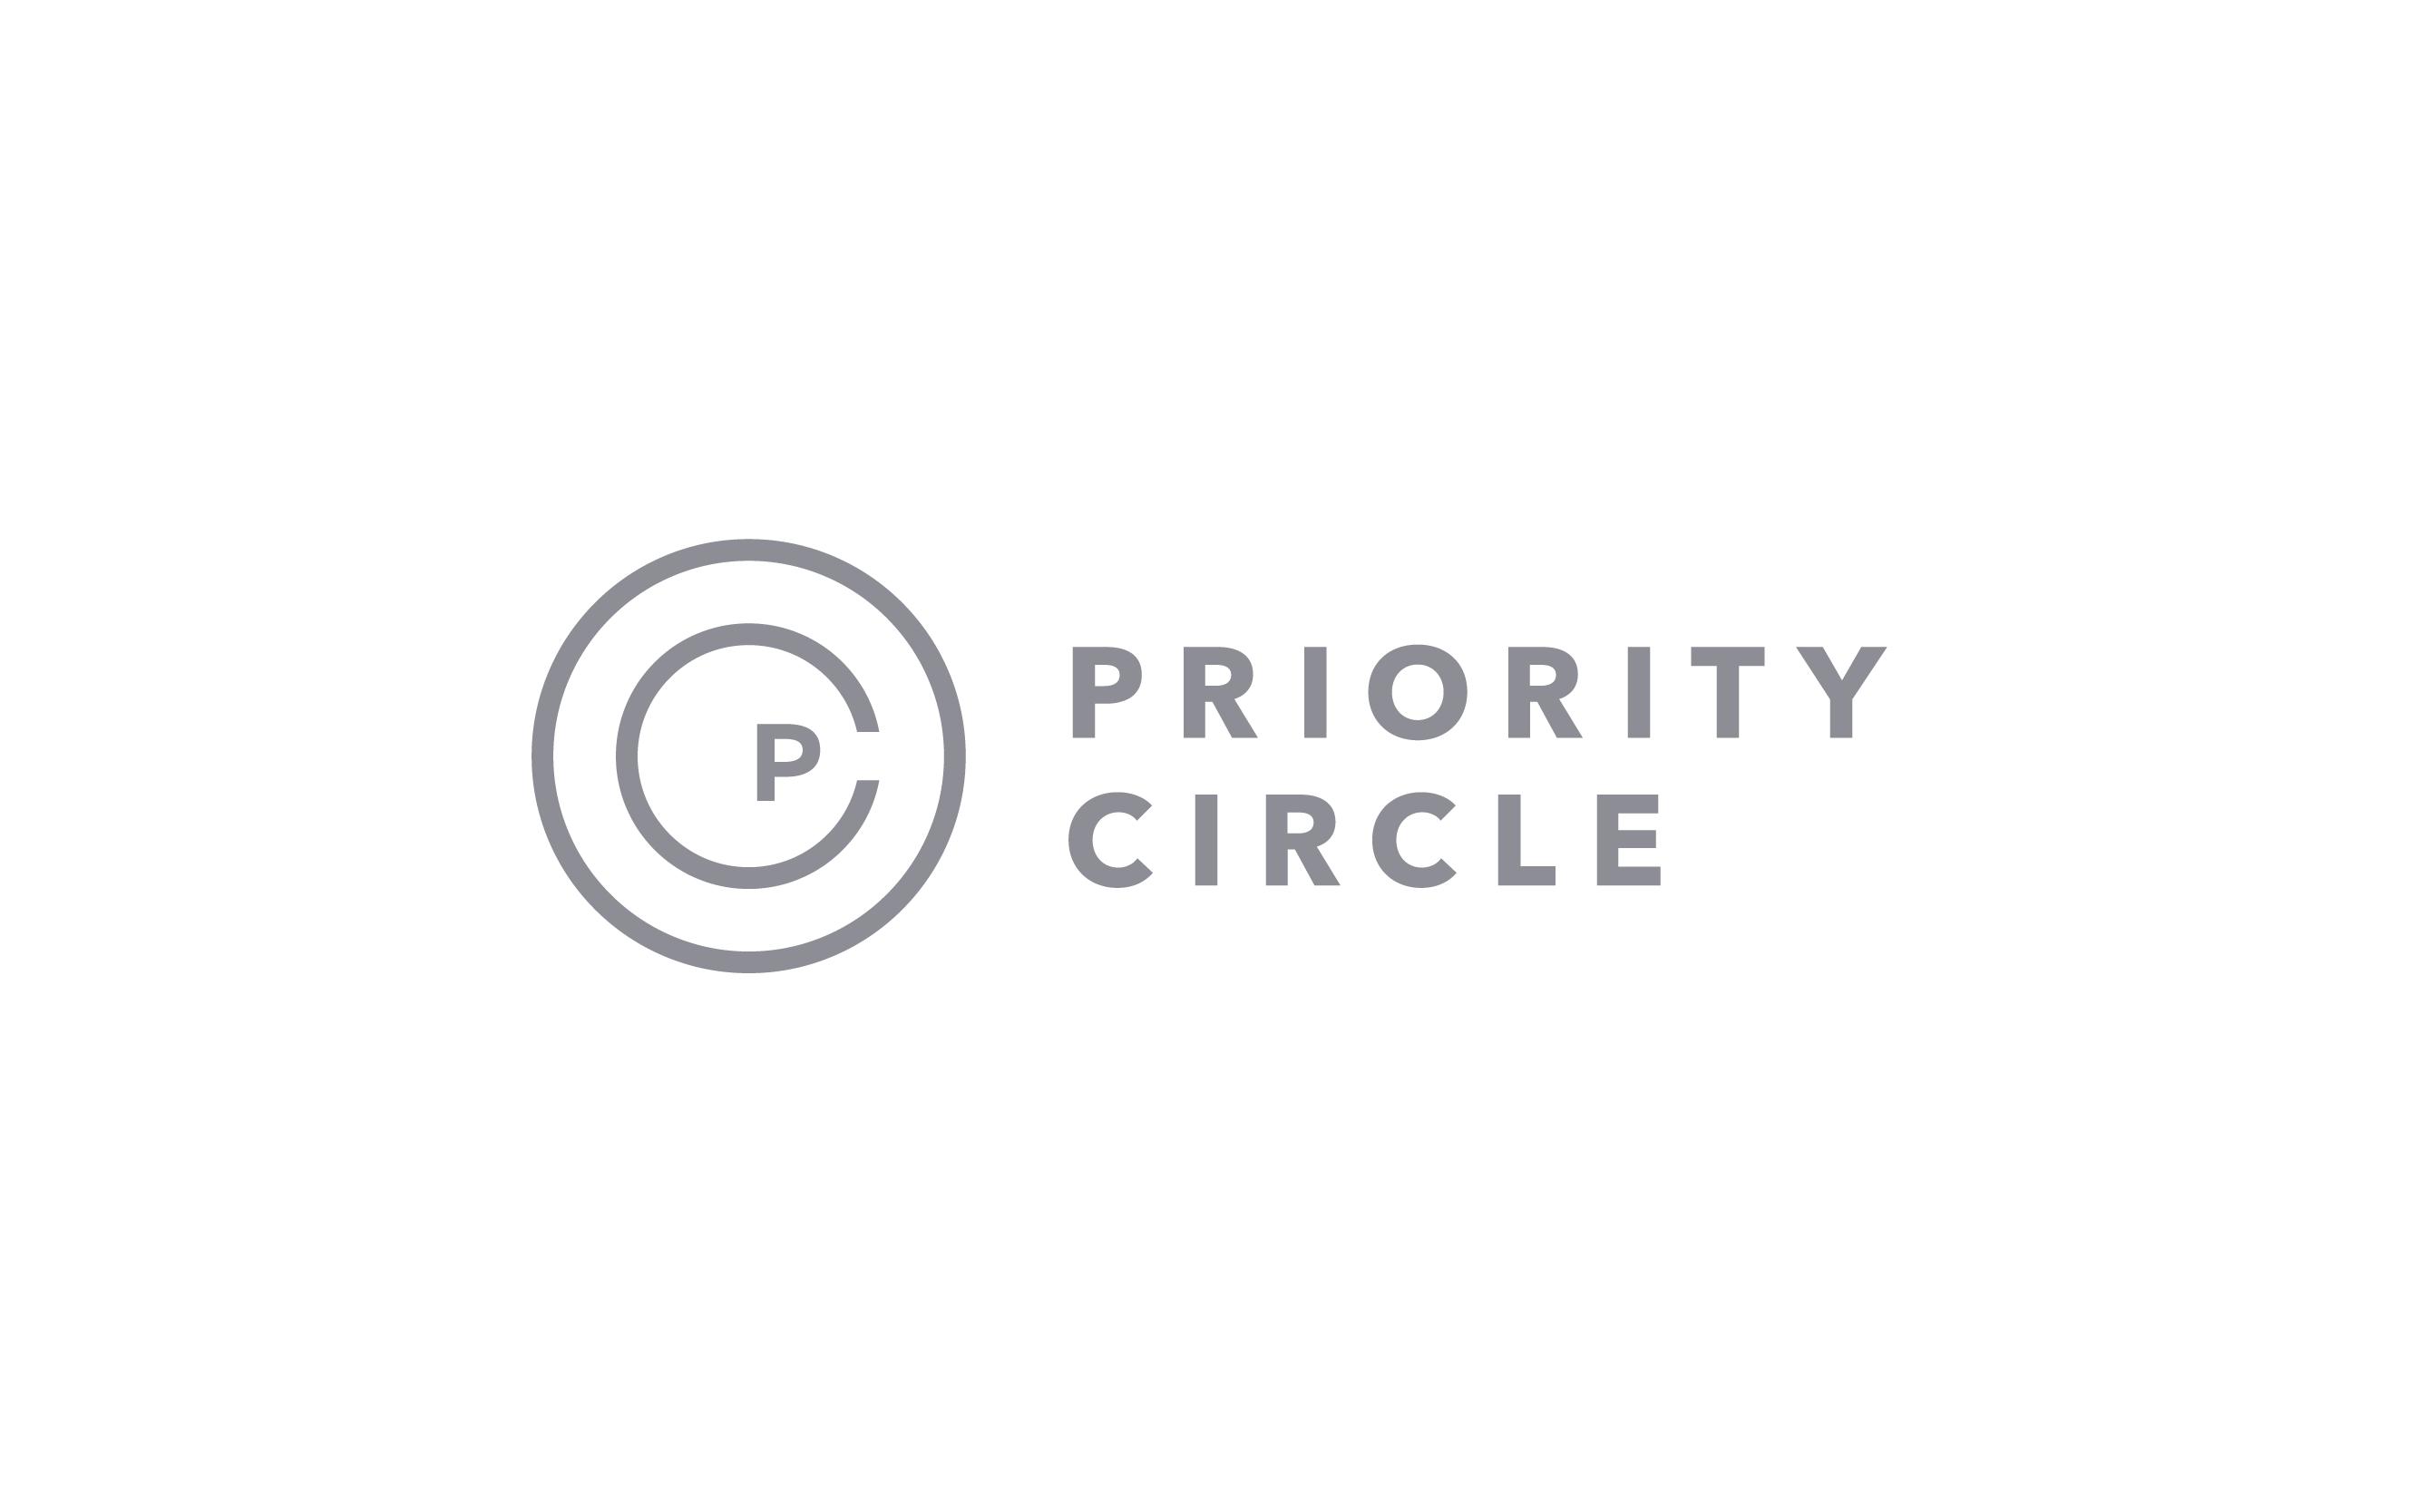 qb_priority_circle-08